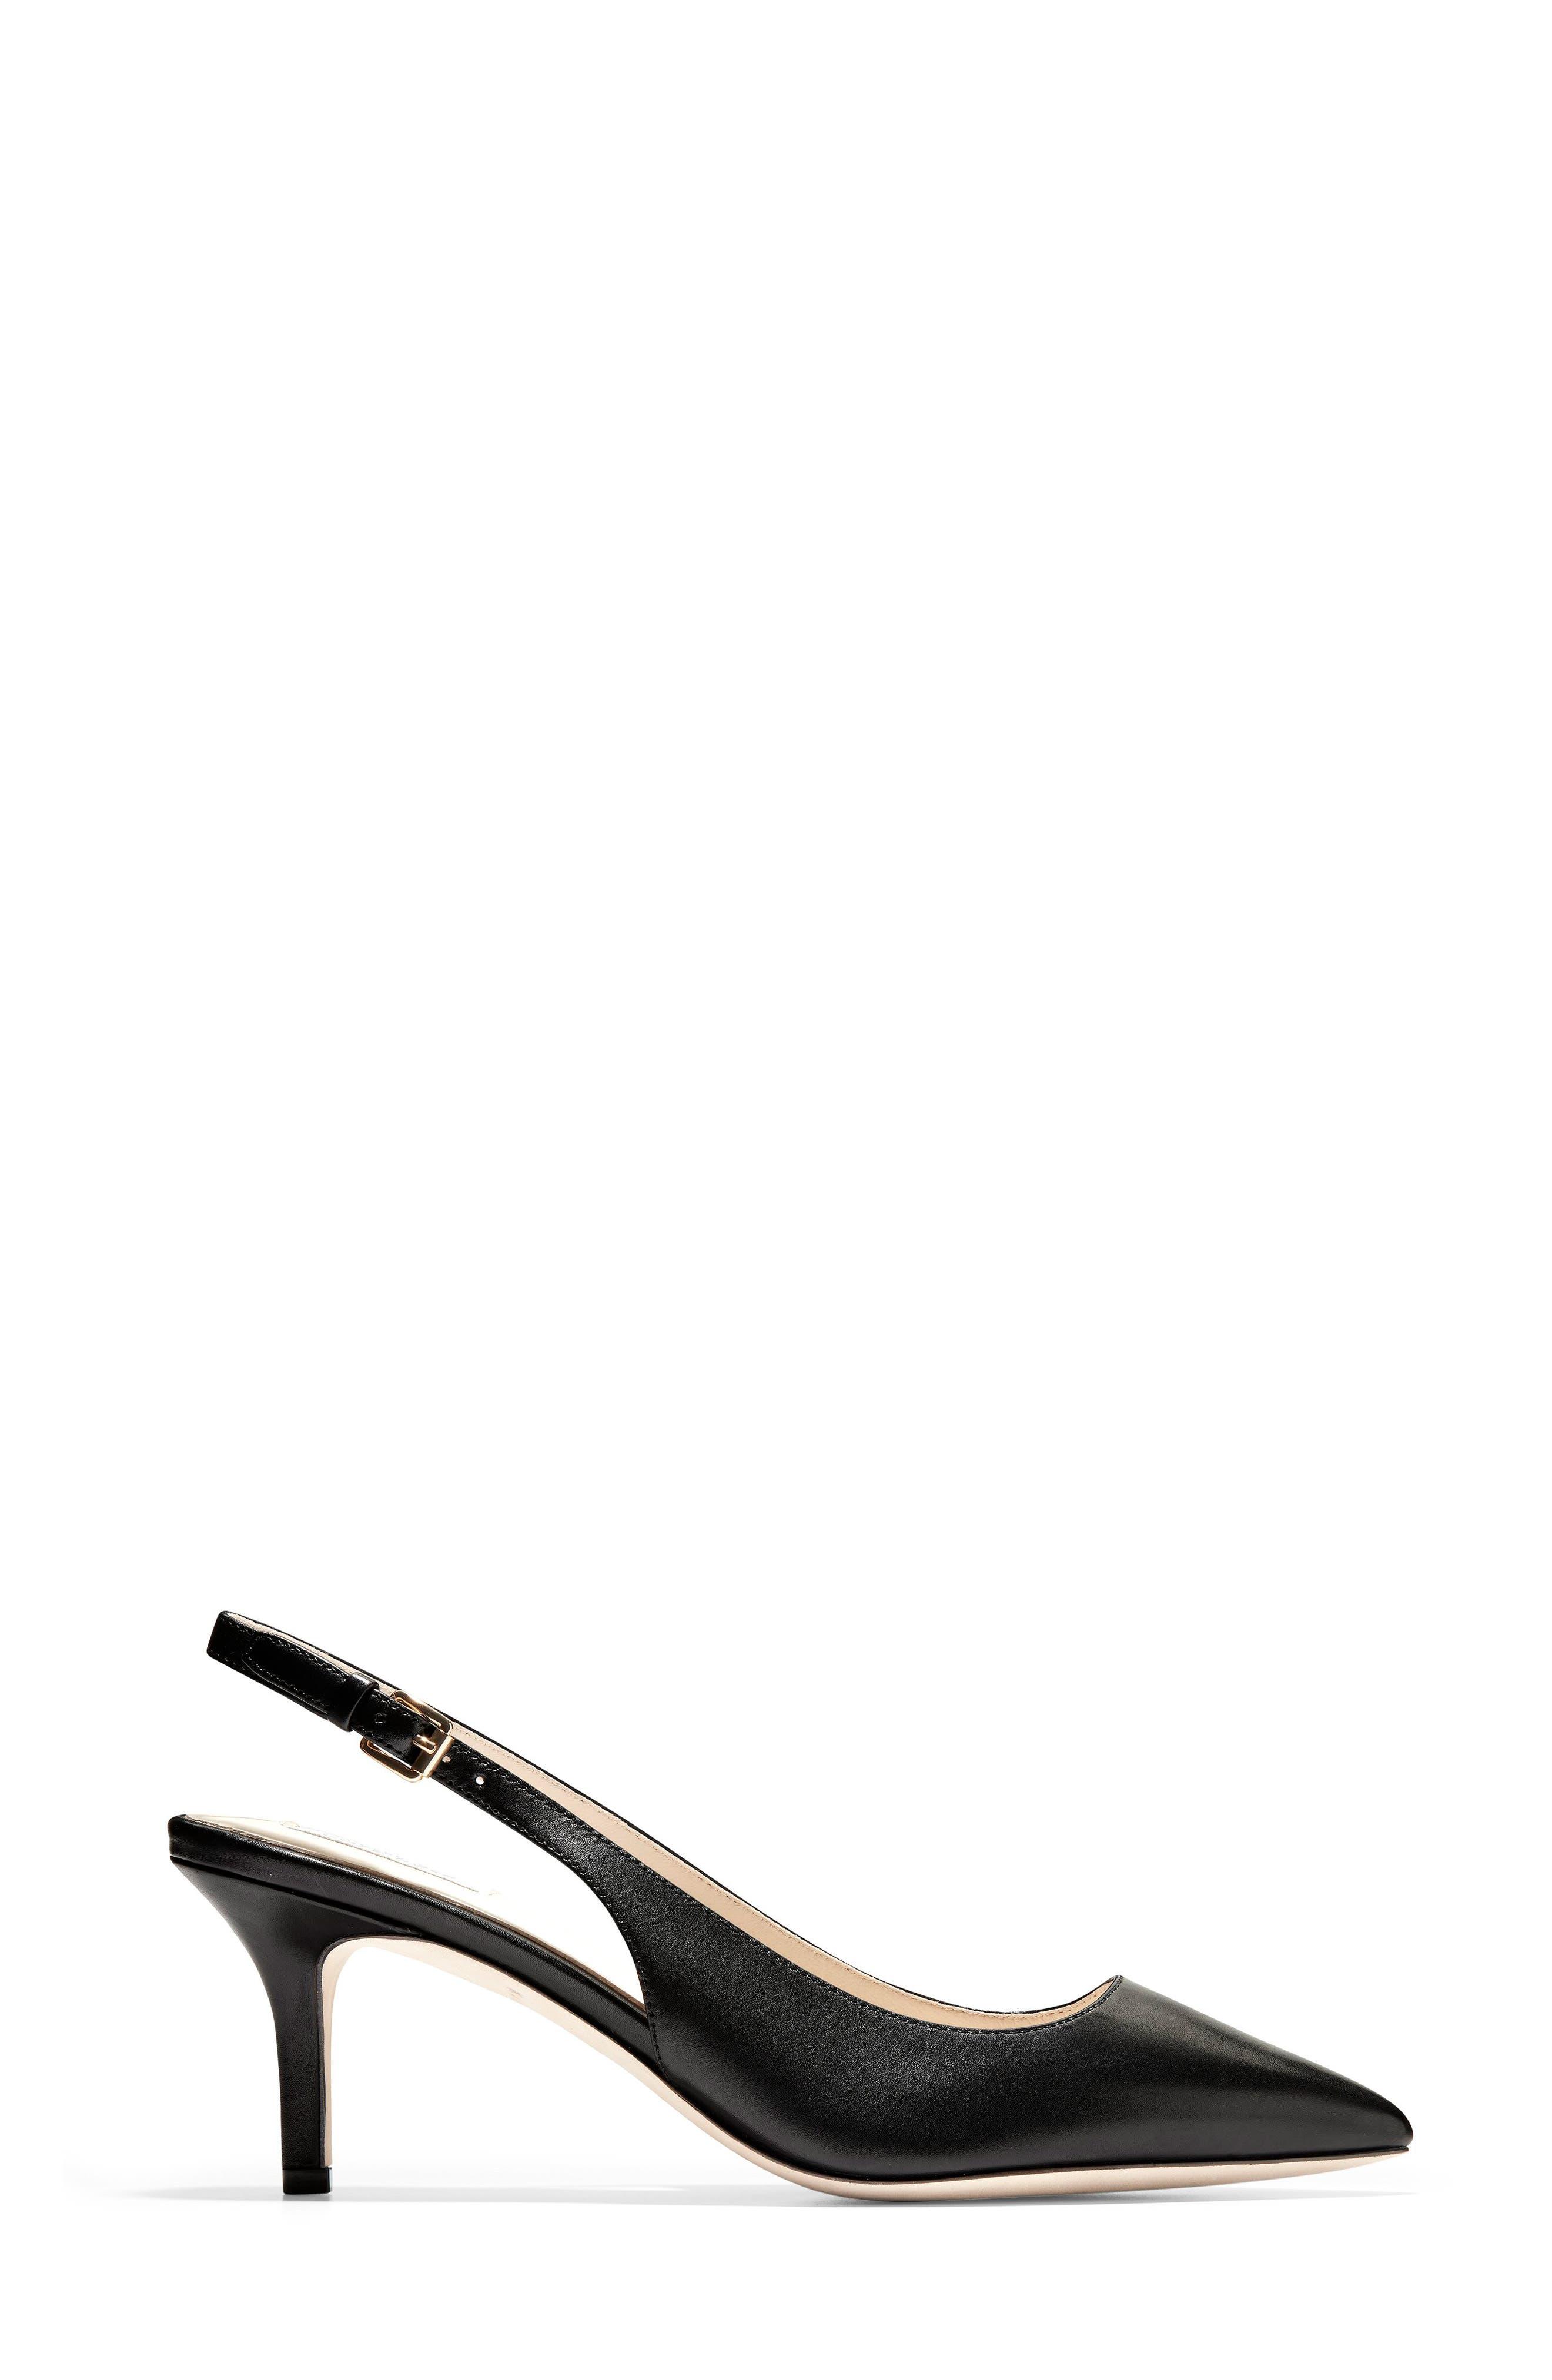 COLE HAAN,                             Vesta Slingback Pump,                             Alternate thumbnail 3, color,                             BLACK LEATHER